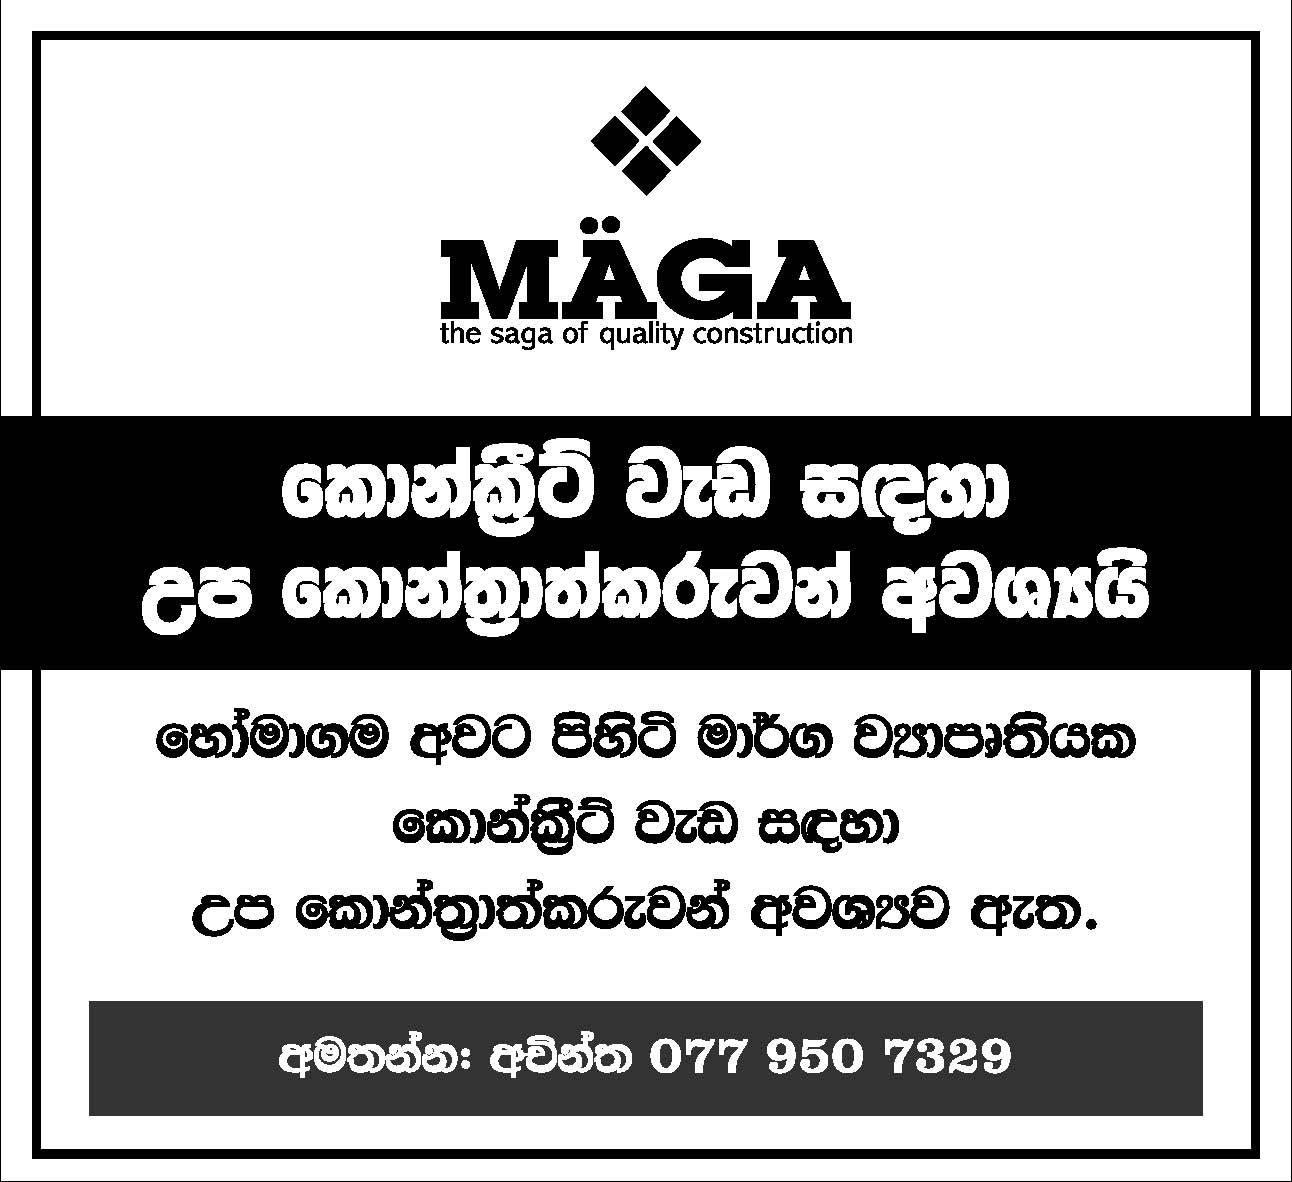 Sub Contractor - MAGA Engineering (Pvt) Ltd